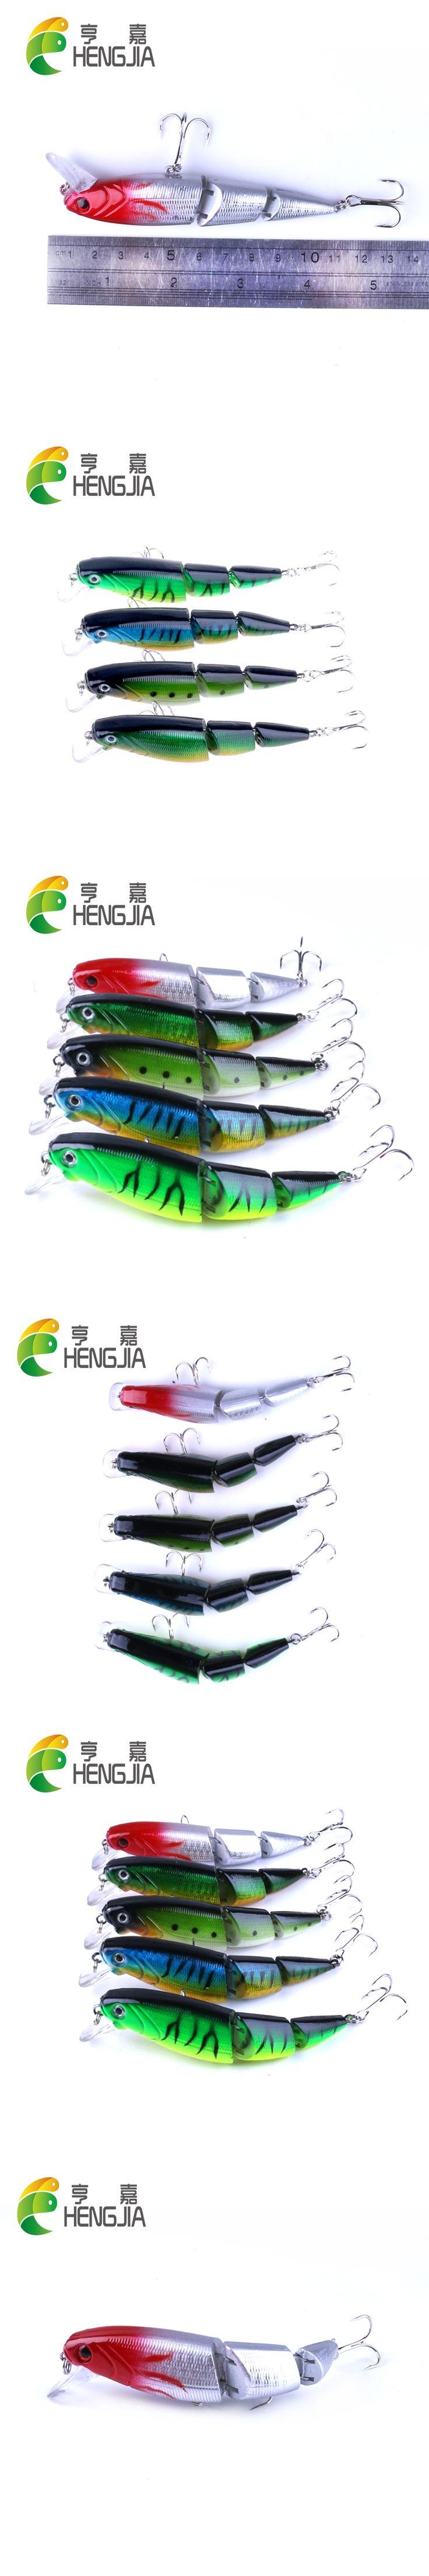 HENGJIA 10.5cm 14g hard plastic jointed minnow fishing lures artificial wobblers crankbaits carp catfish pesca swimbaits tackles